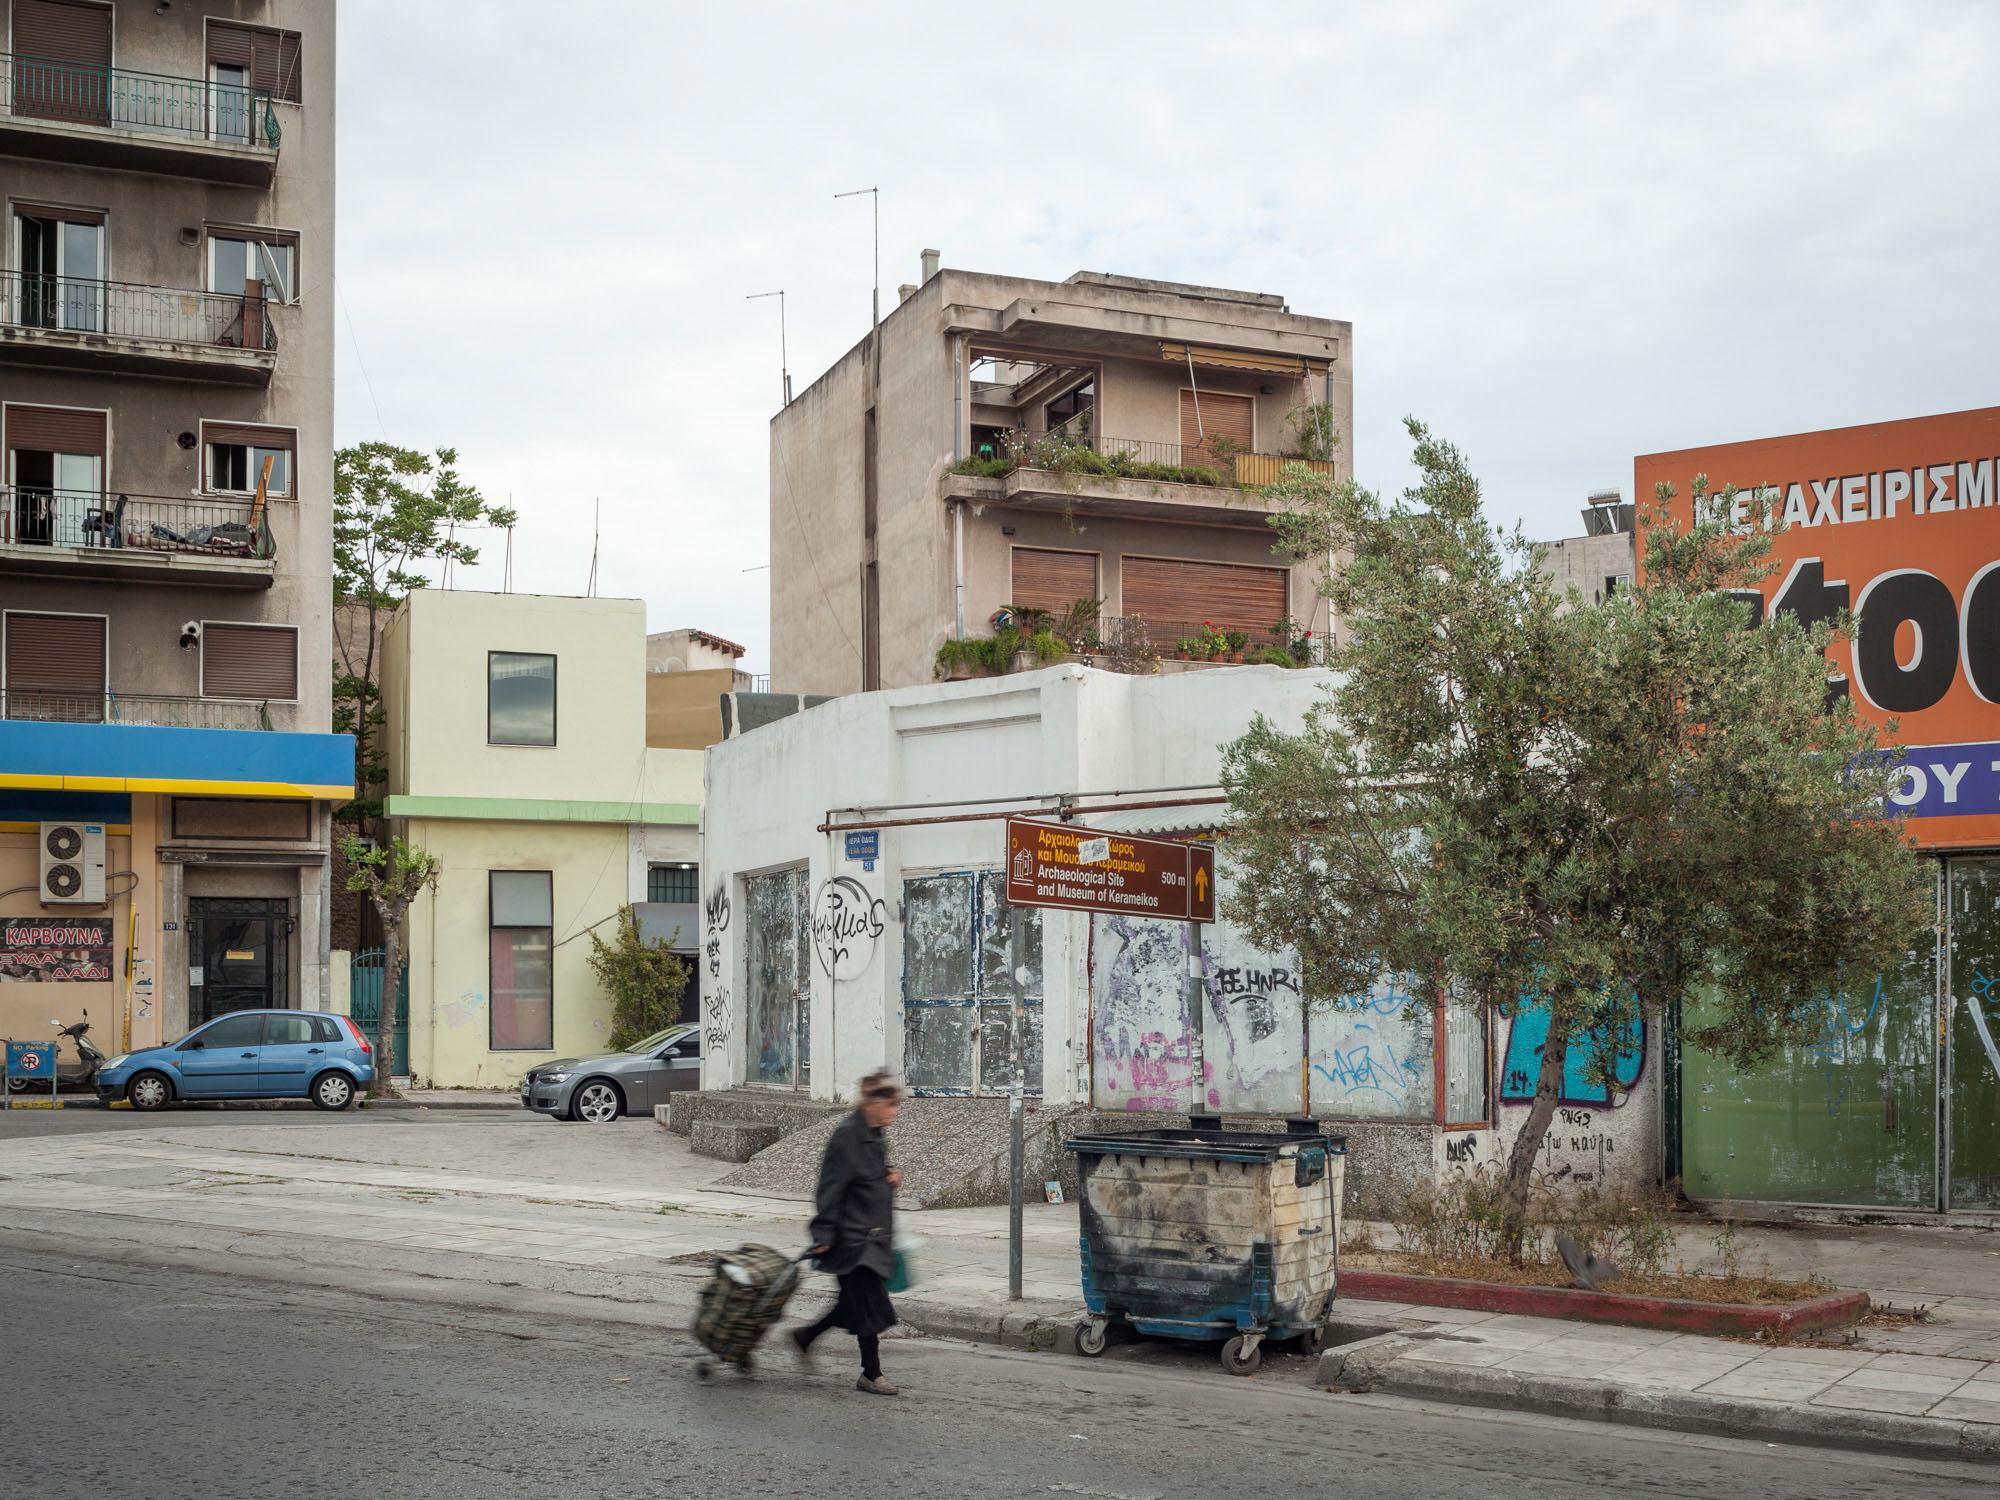 Athen-4362.jpg